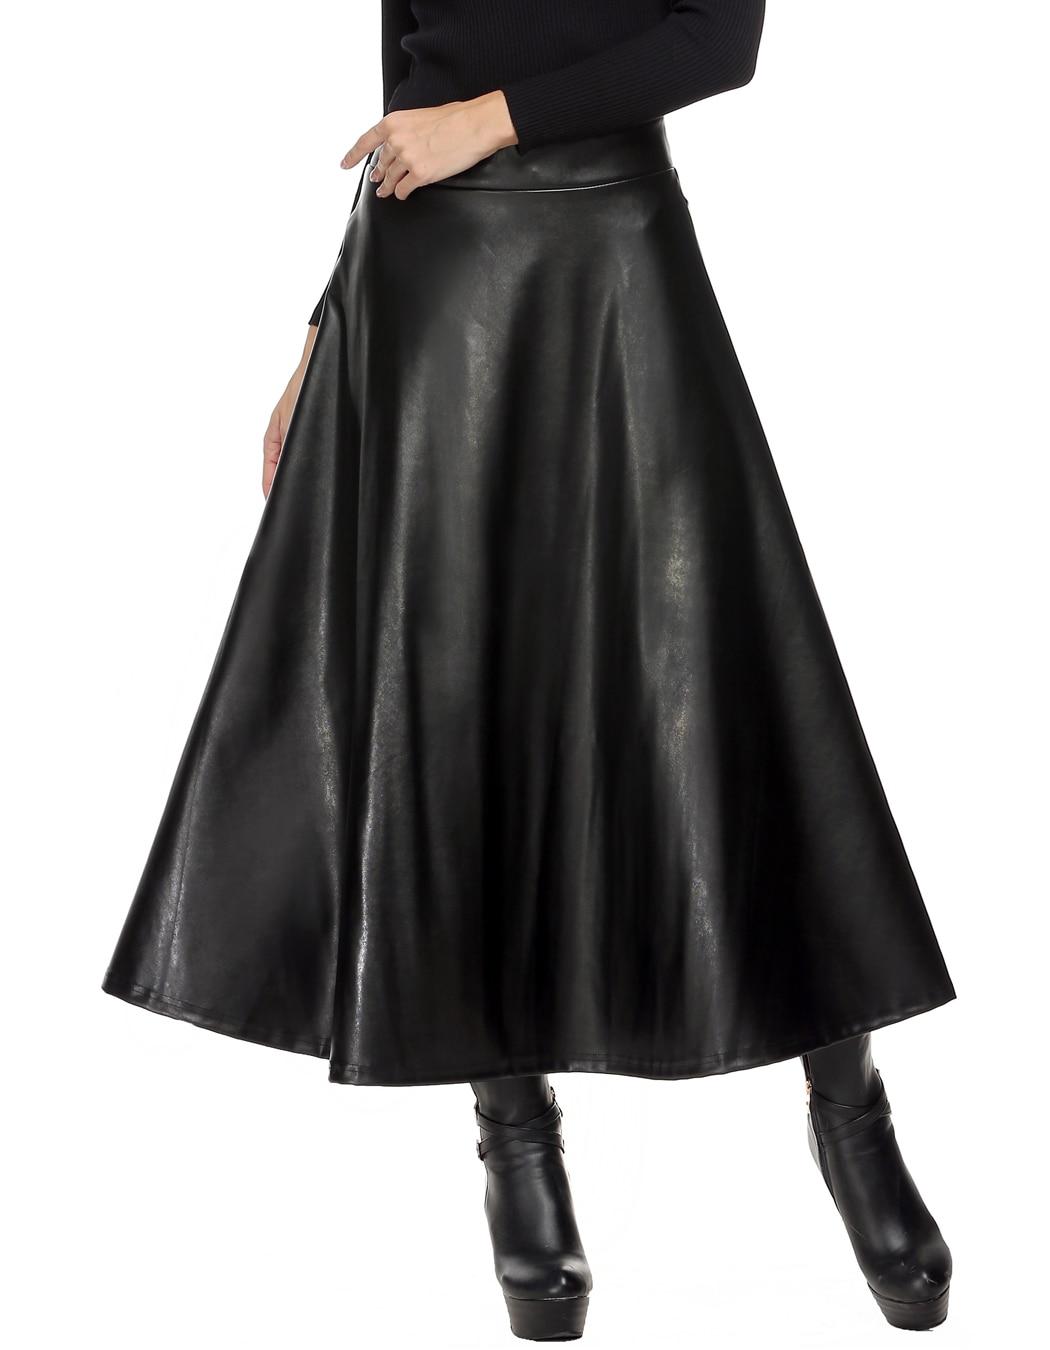 Winter Pu Leather Skirt Women Maxi Long Skirts Womens High Waist Slim Autumn Vintage Pleated Skirt Black Xl Xxl 1